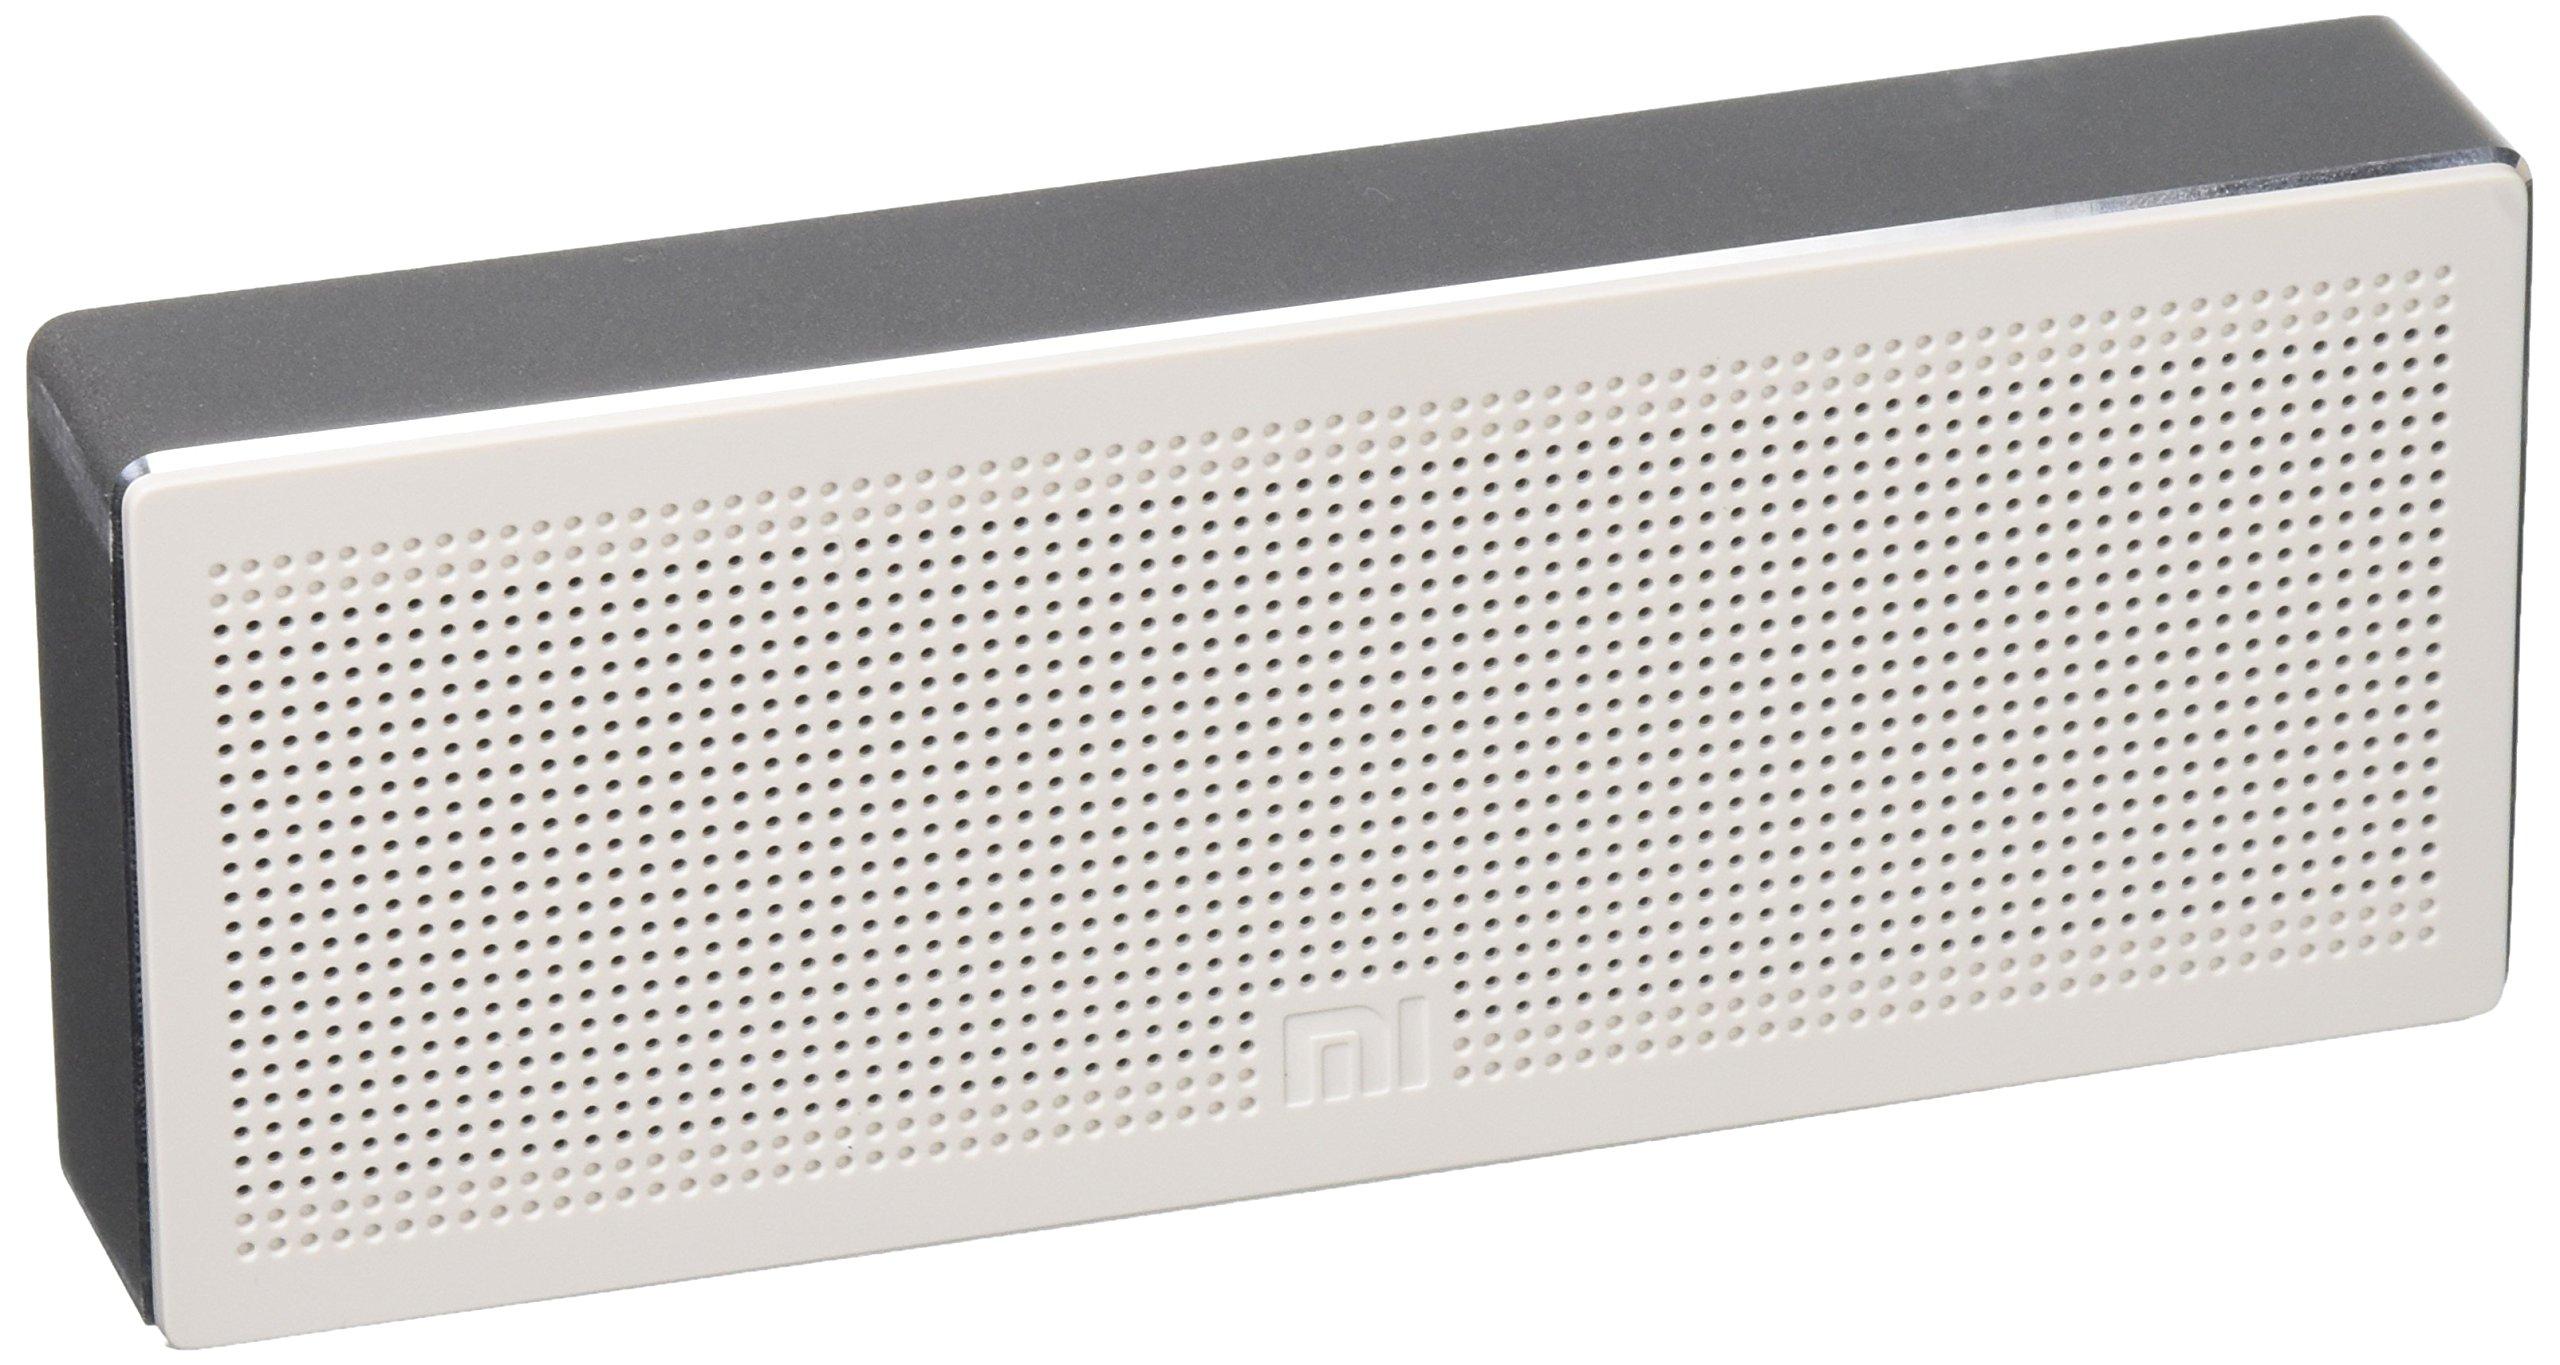 Xiaomi Mi Portable Wireless Bluetooth Speaker Mini Handsfree Call USB Amplifier Stereo Sound Box Portable MP3 Player Wireless Speaker